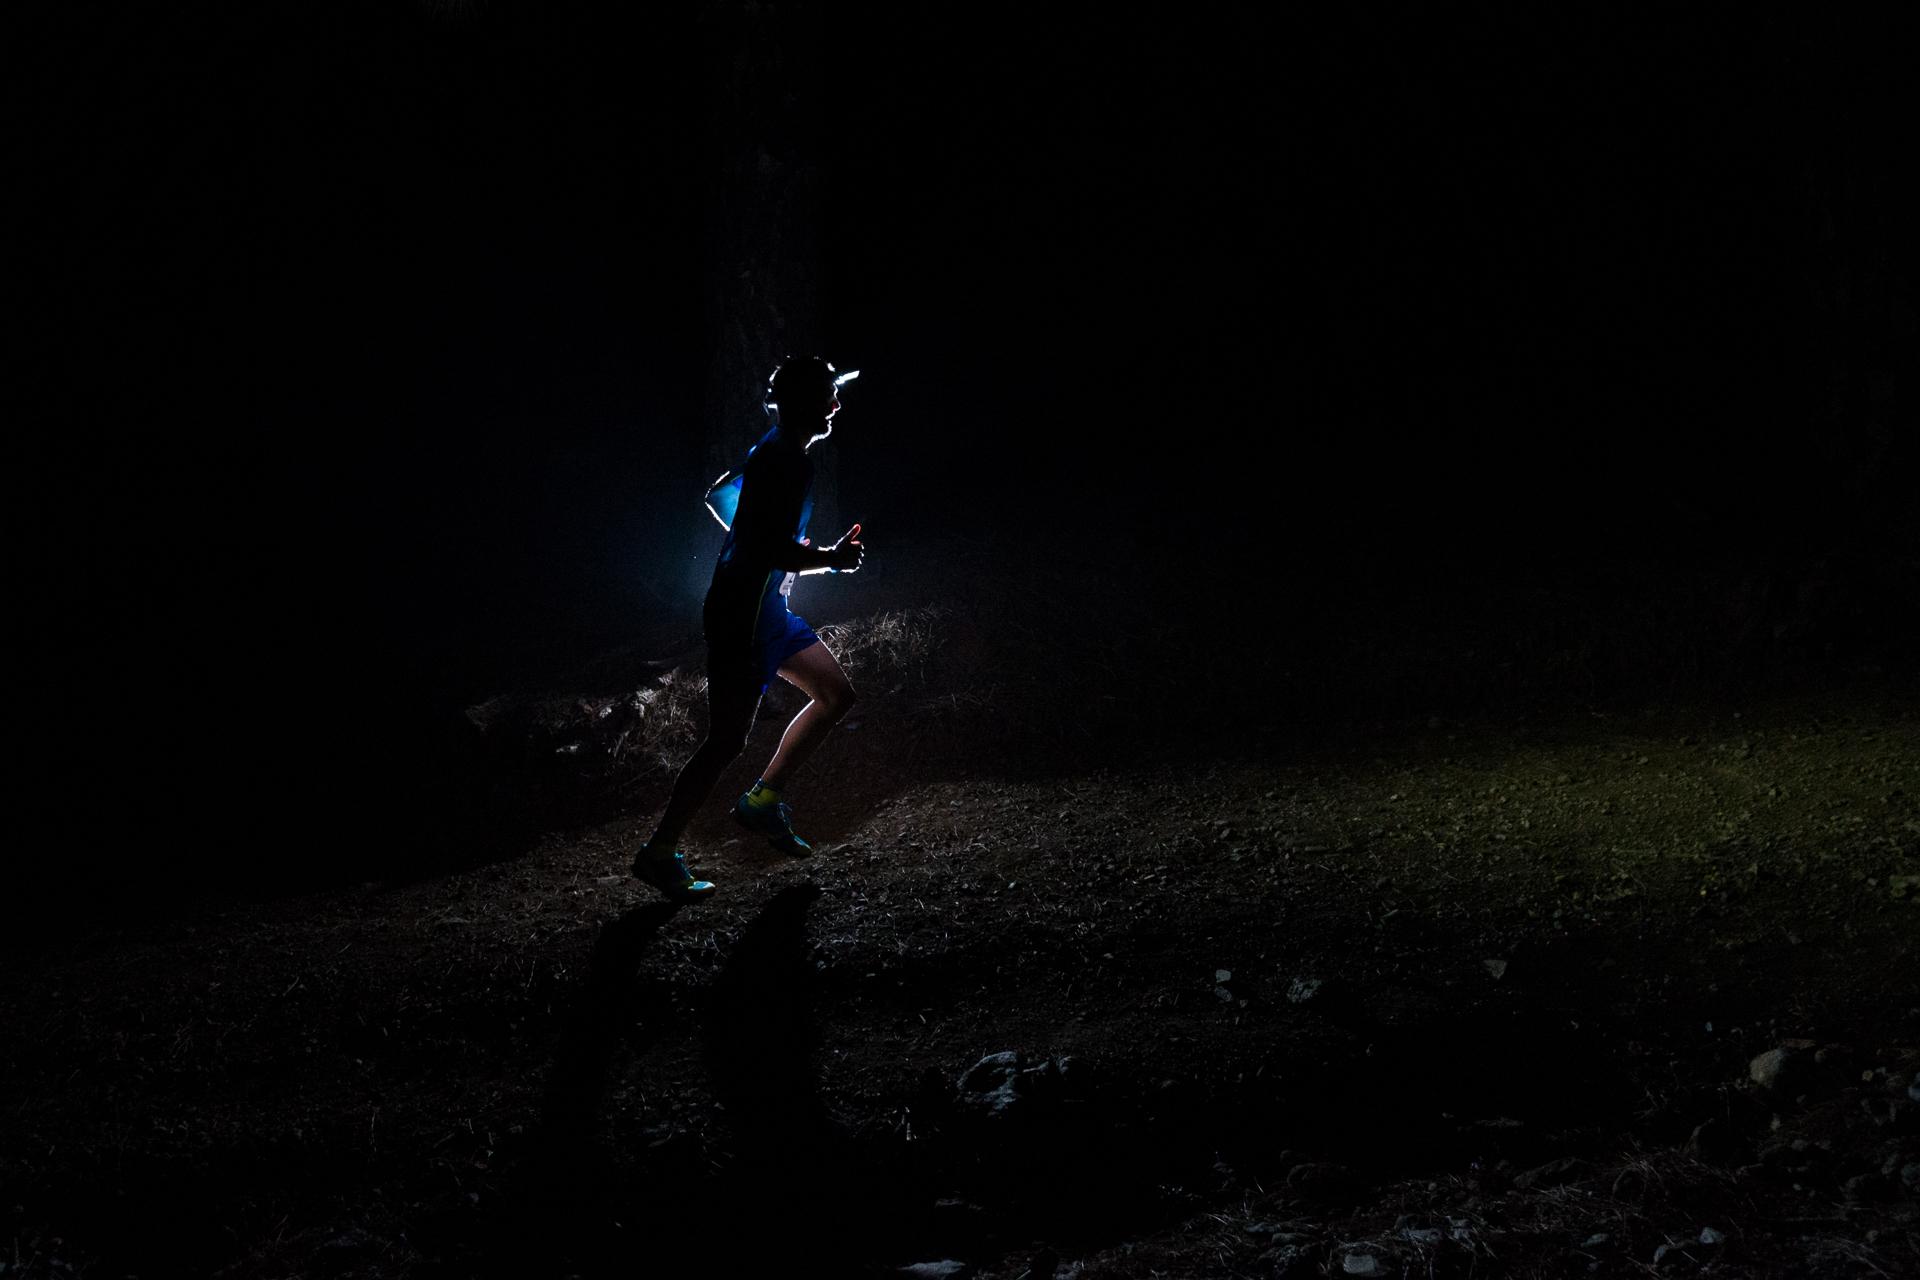 Foto de Saúl Santo de la Subida a la Subida a las Estrellas.